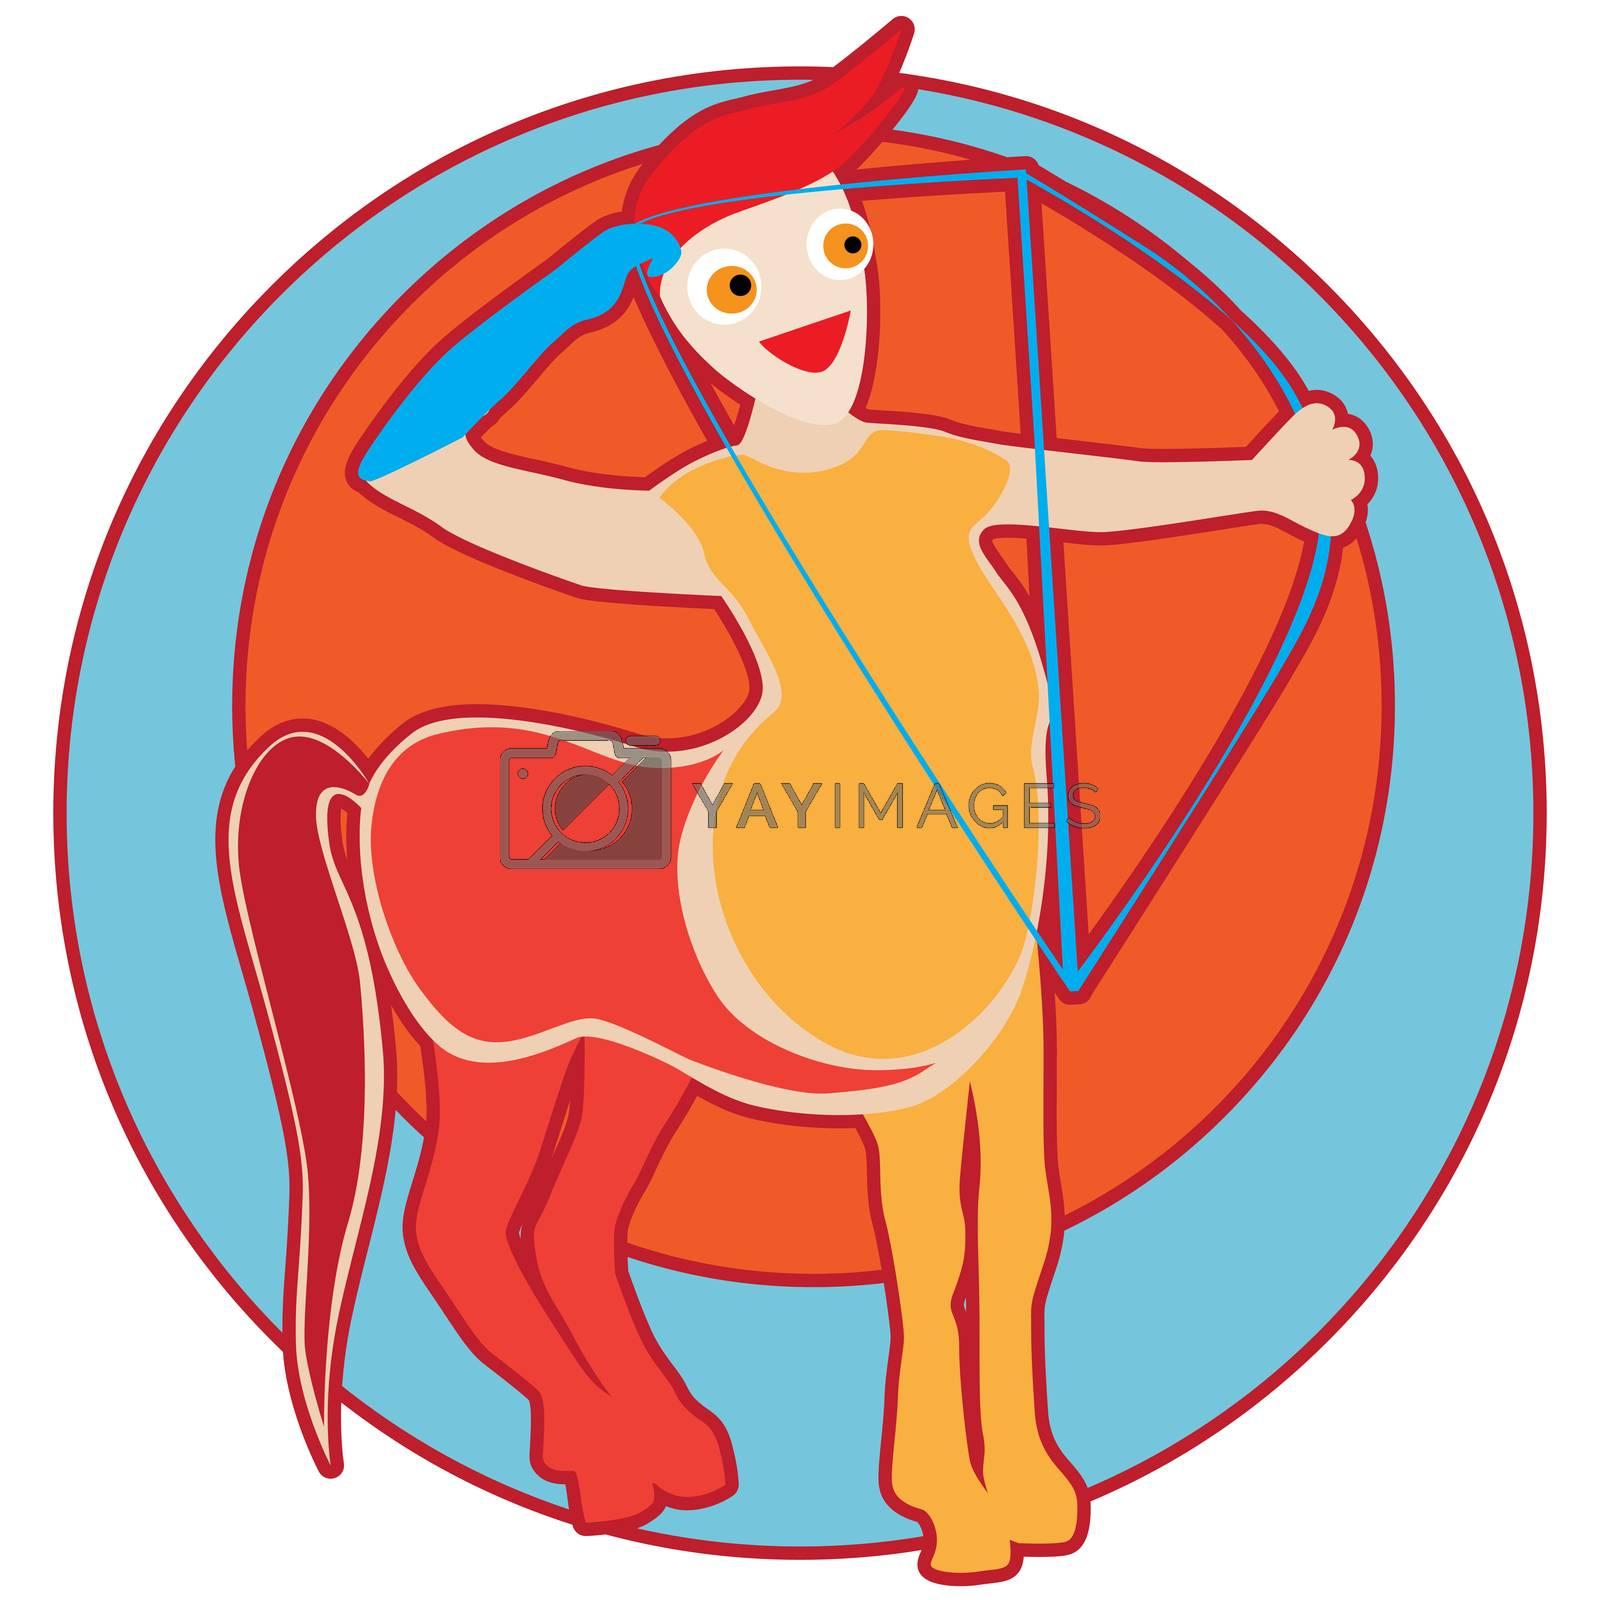 Happy Sagittarius sticker, clip-art hand drawn illustration of a cheerful cartoon character isolated on white